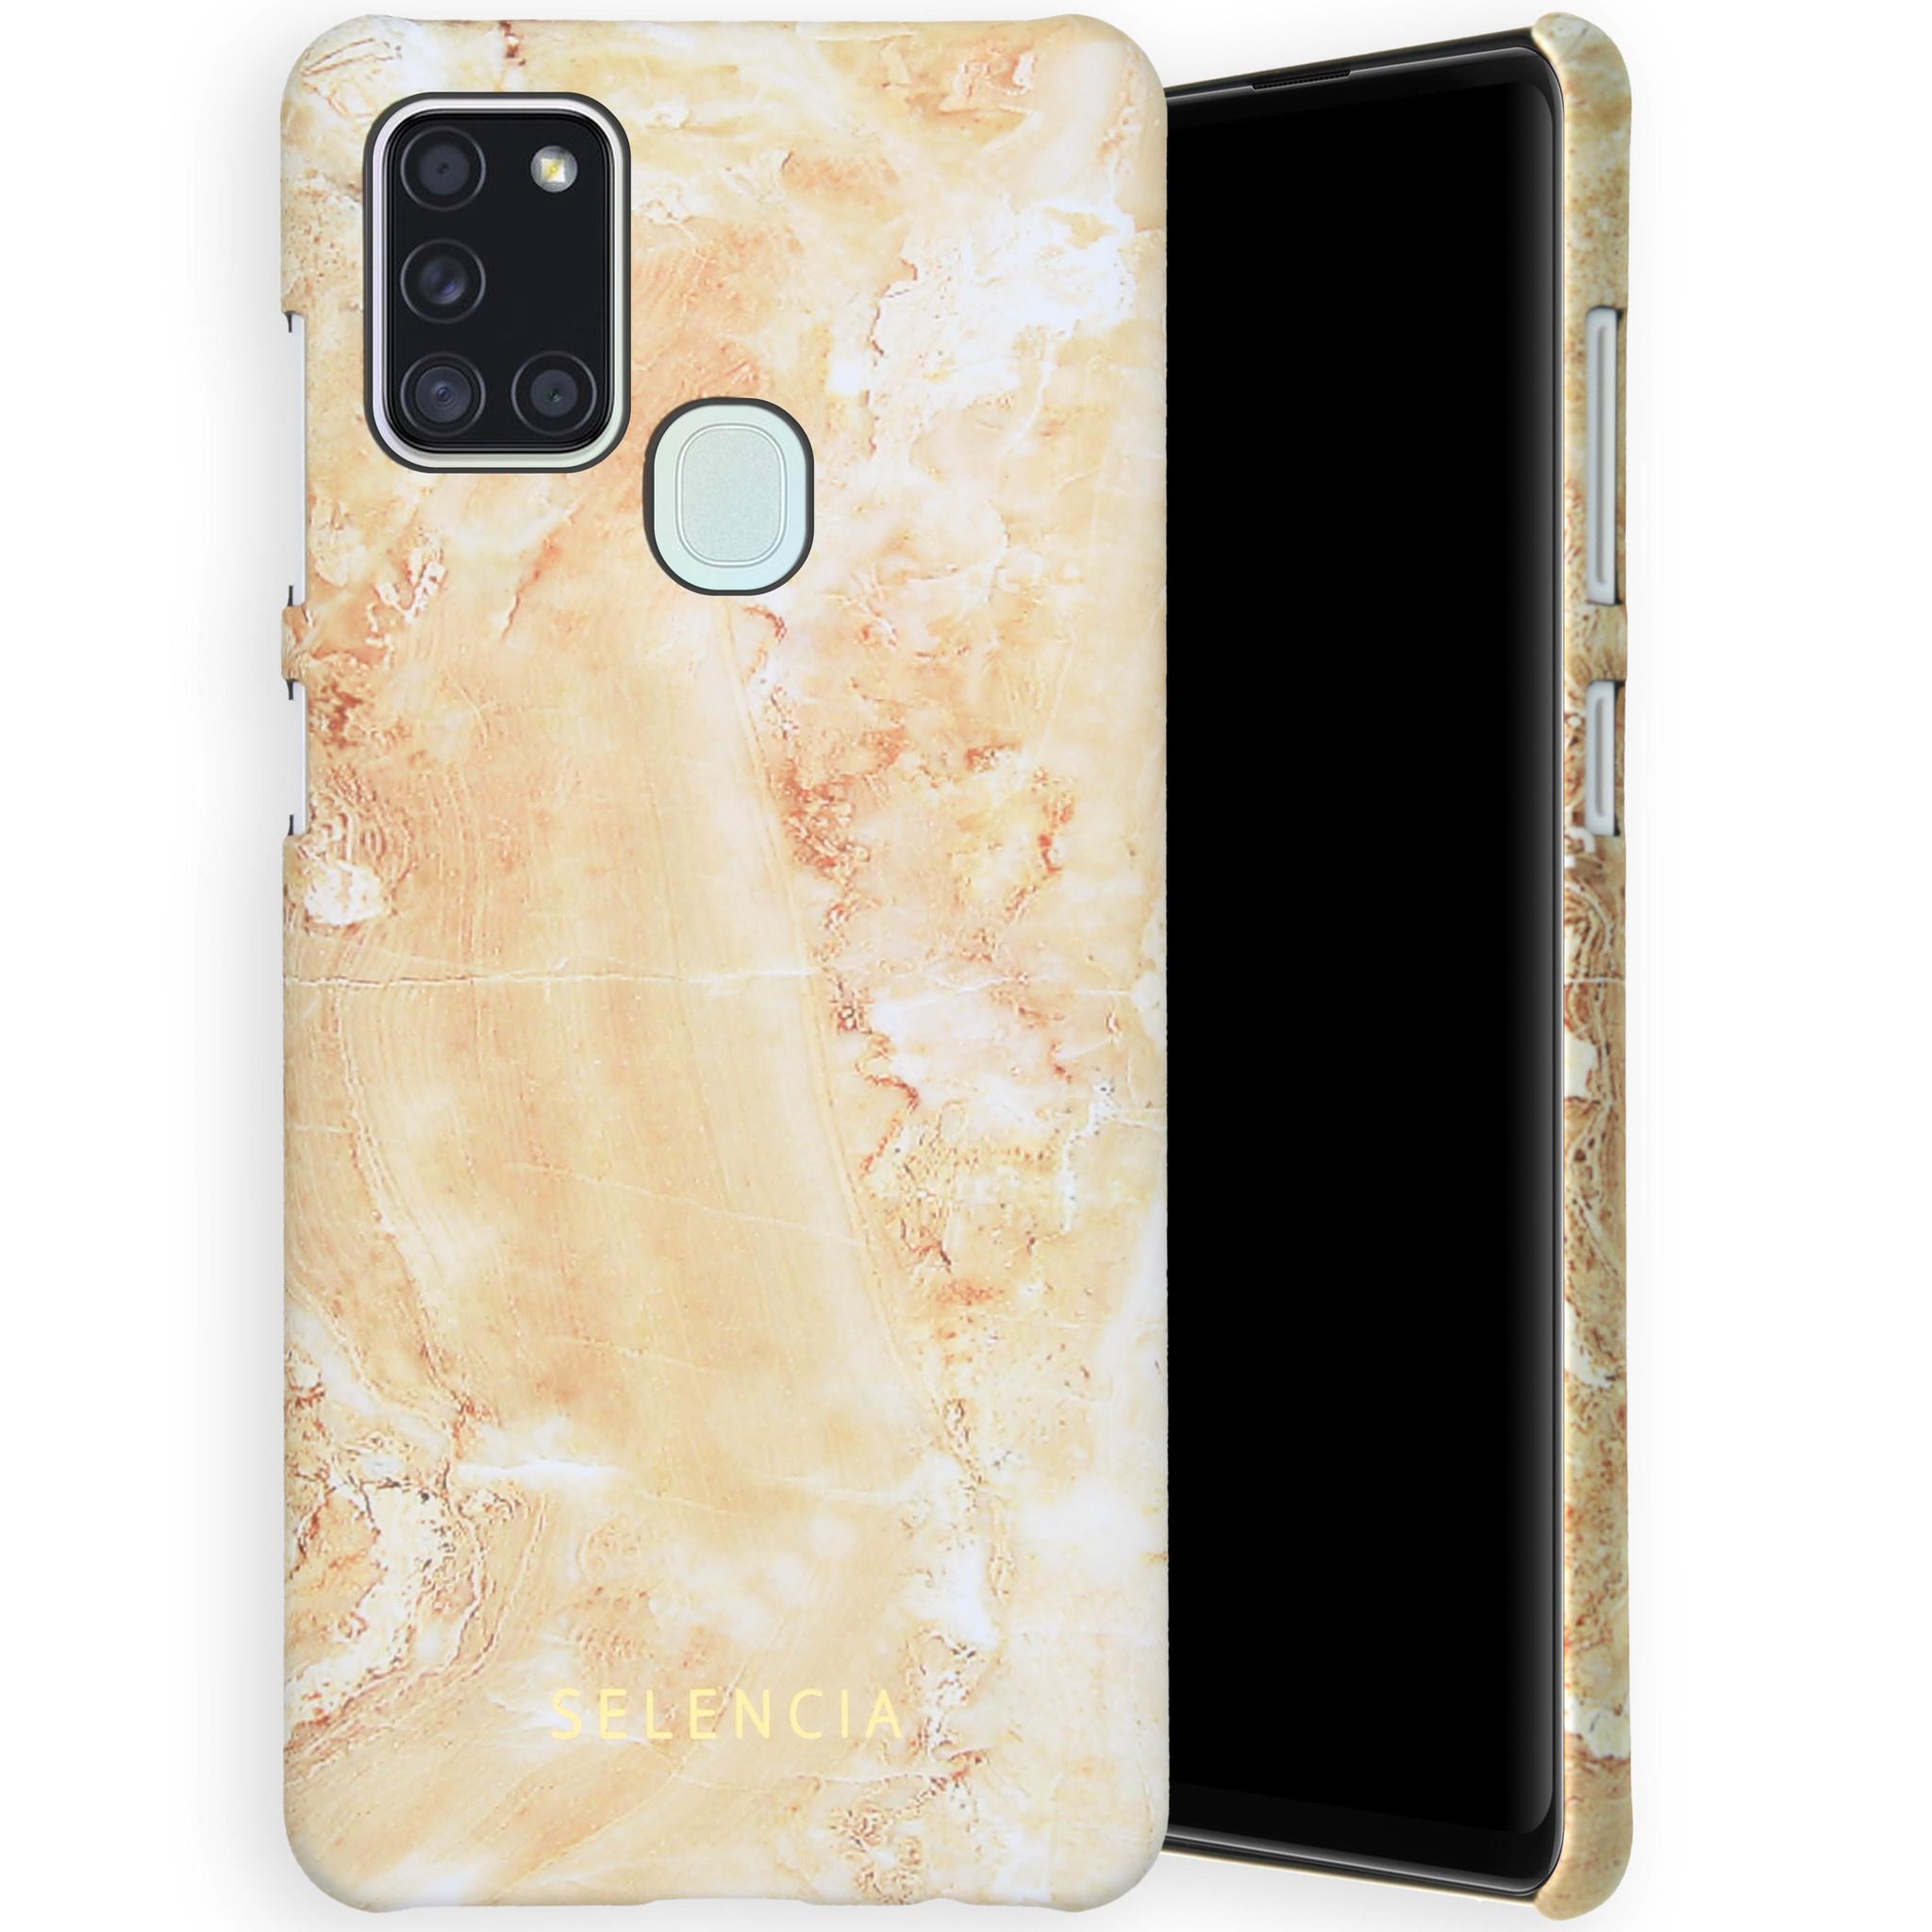 Selencia Coque Maya Fashion Samsung Galaxy A21s - Marble Sand